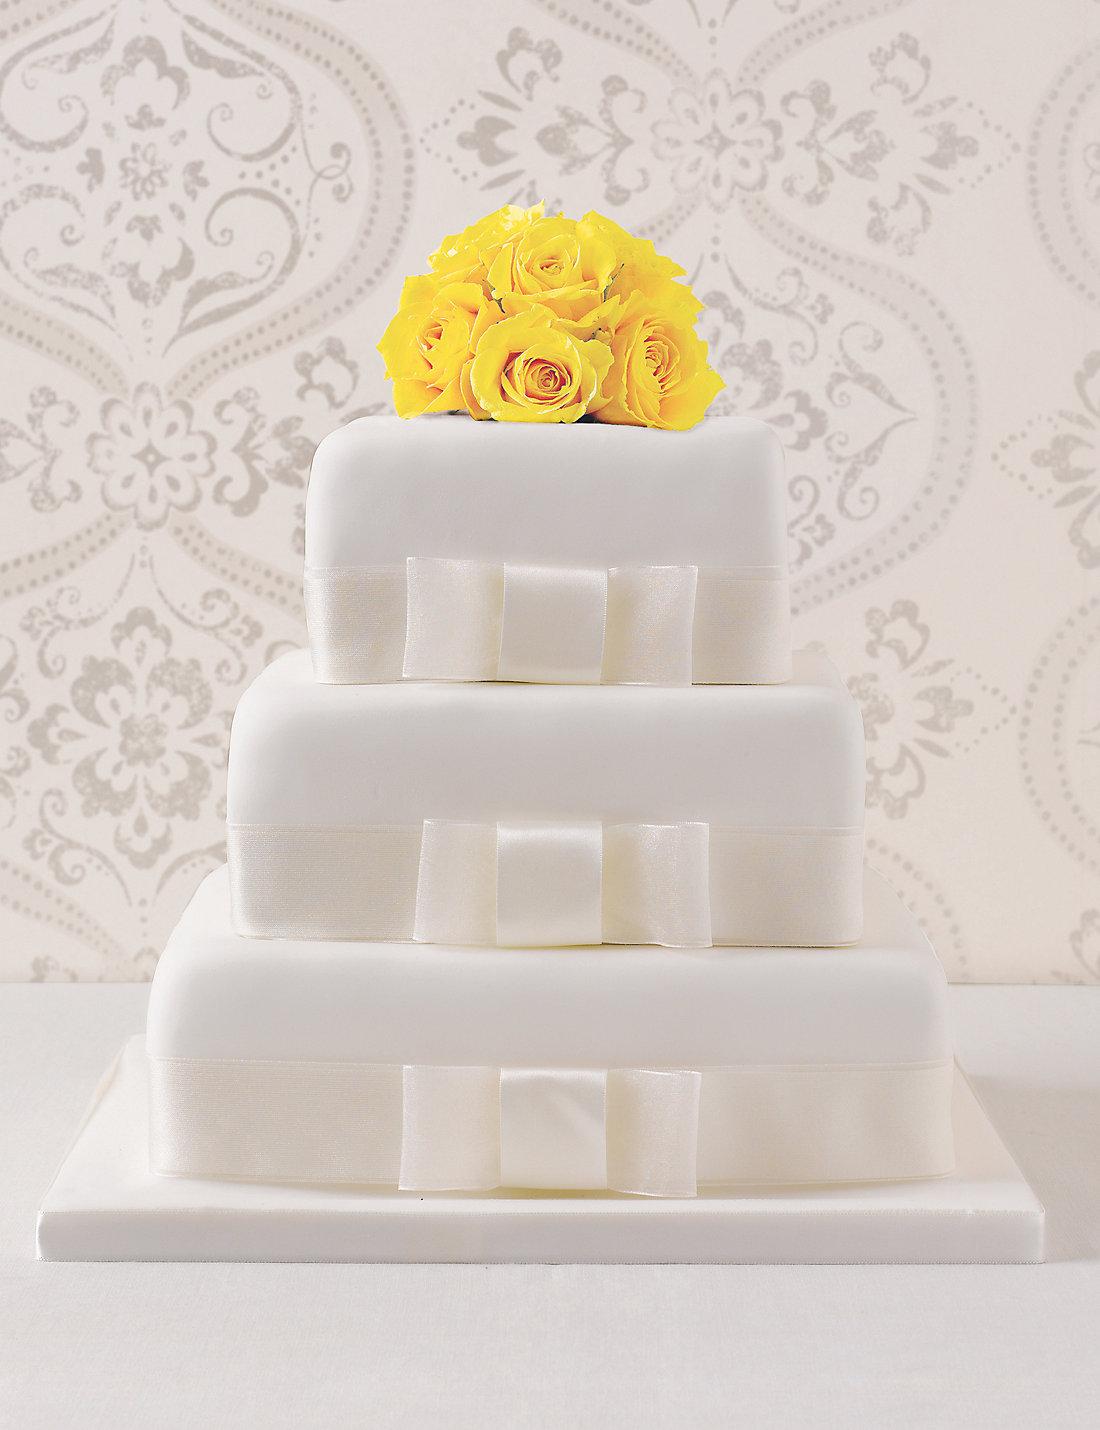 3 tier elegant chocolate wedding cake ms 3 tier elegant chocolate wedding cake junglespirit Choice Image